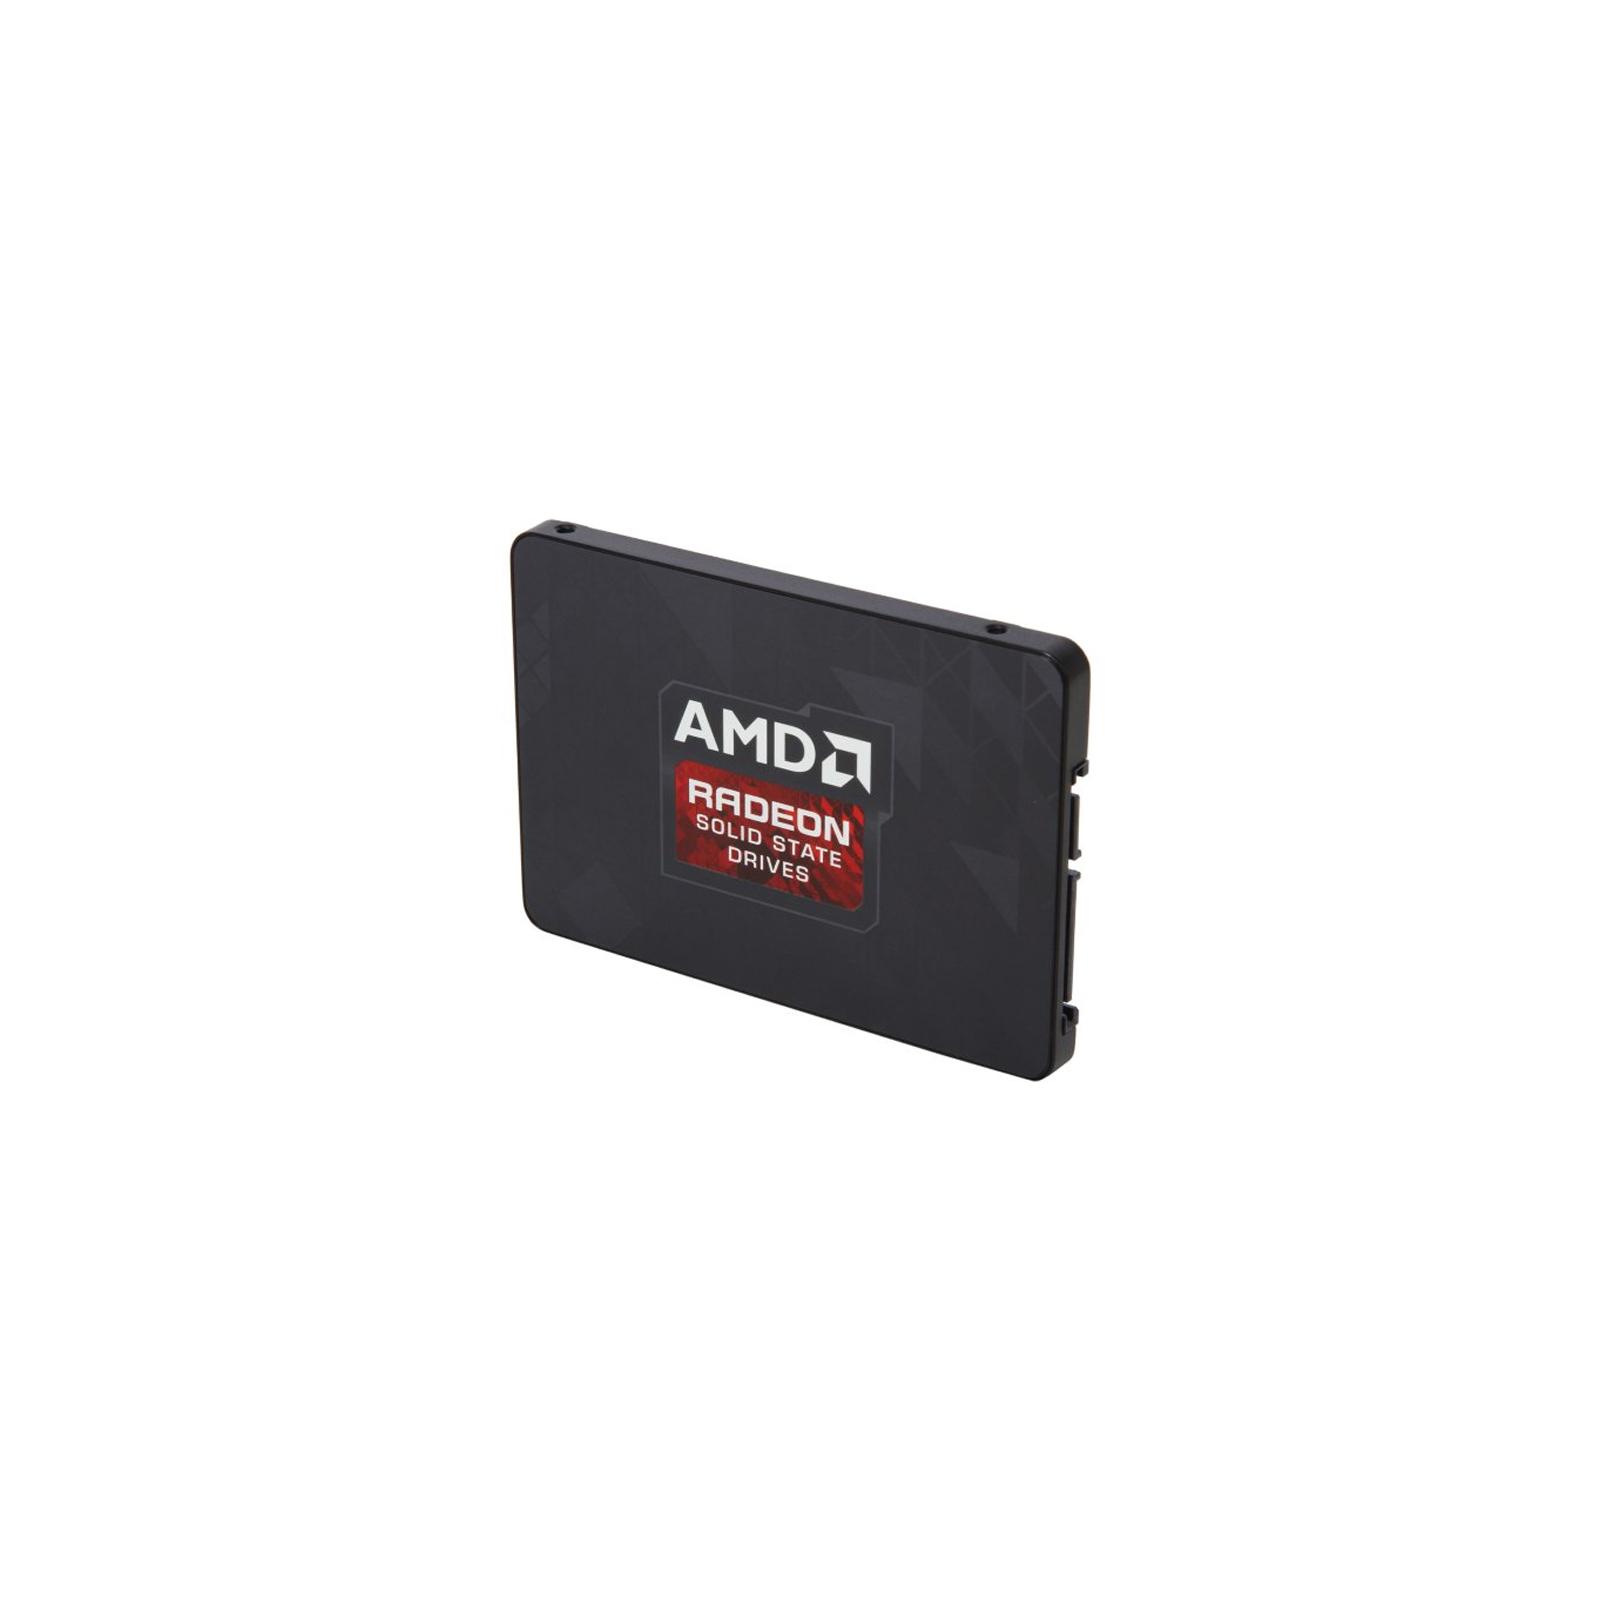 "Накопитель SSD 2.5"" 960GB AMD (R3SL960G) изображение 2"